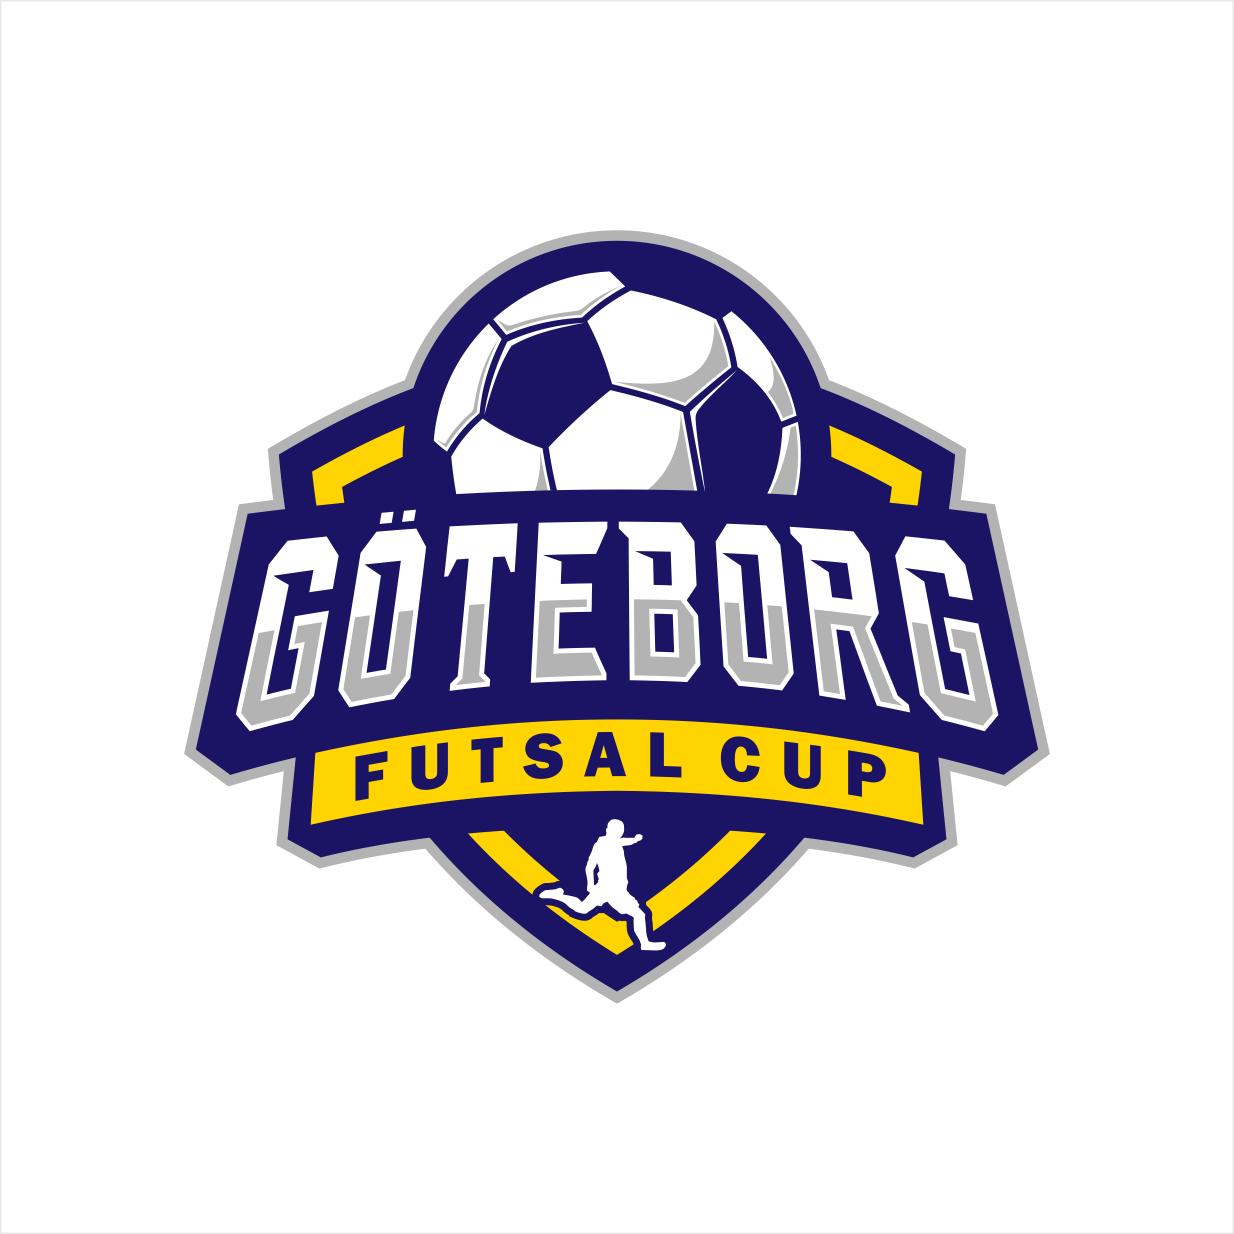 Bold Playful Group Logo Design For Goteborg Futsal Cup By Arkhim789 Design 15892693 Football Logo Design Logo Design Cool Logo